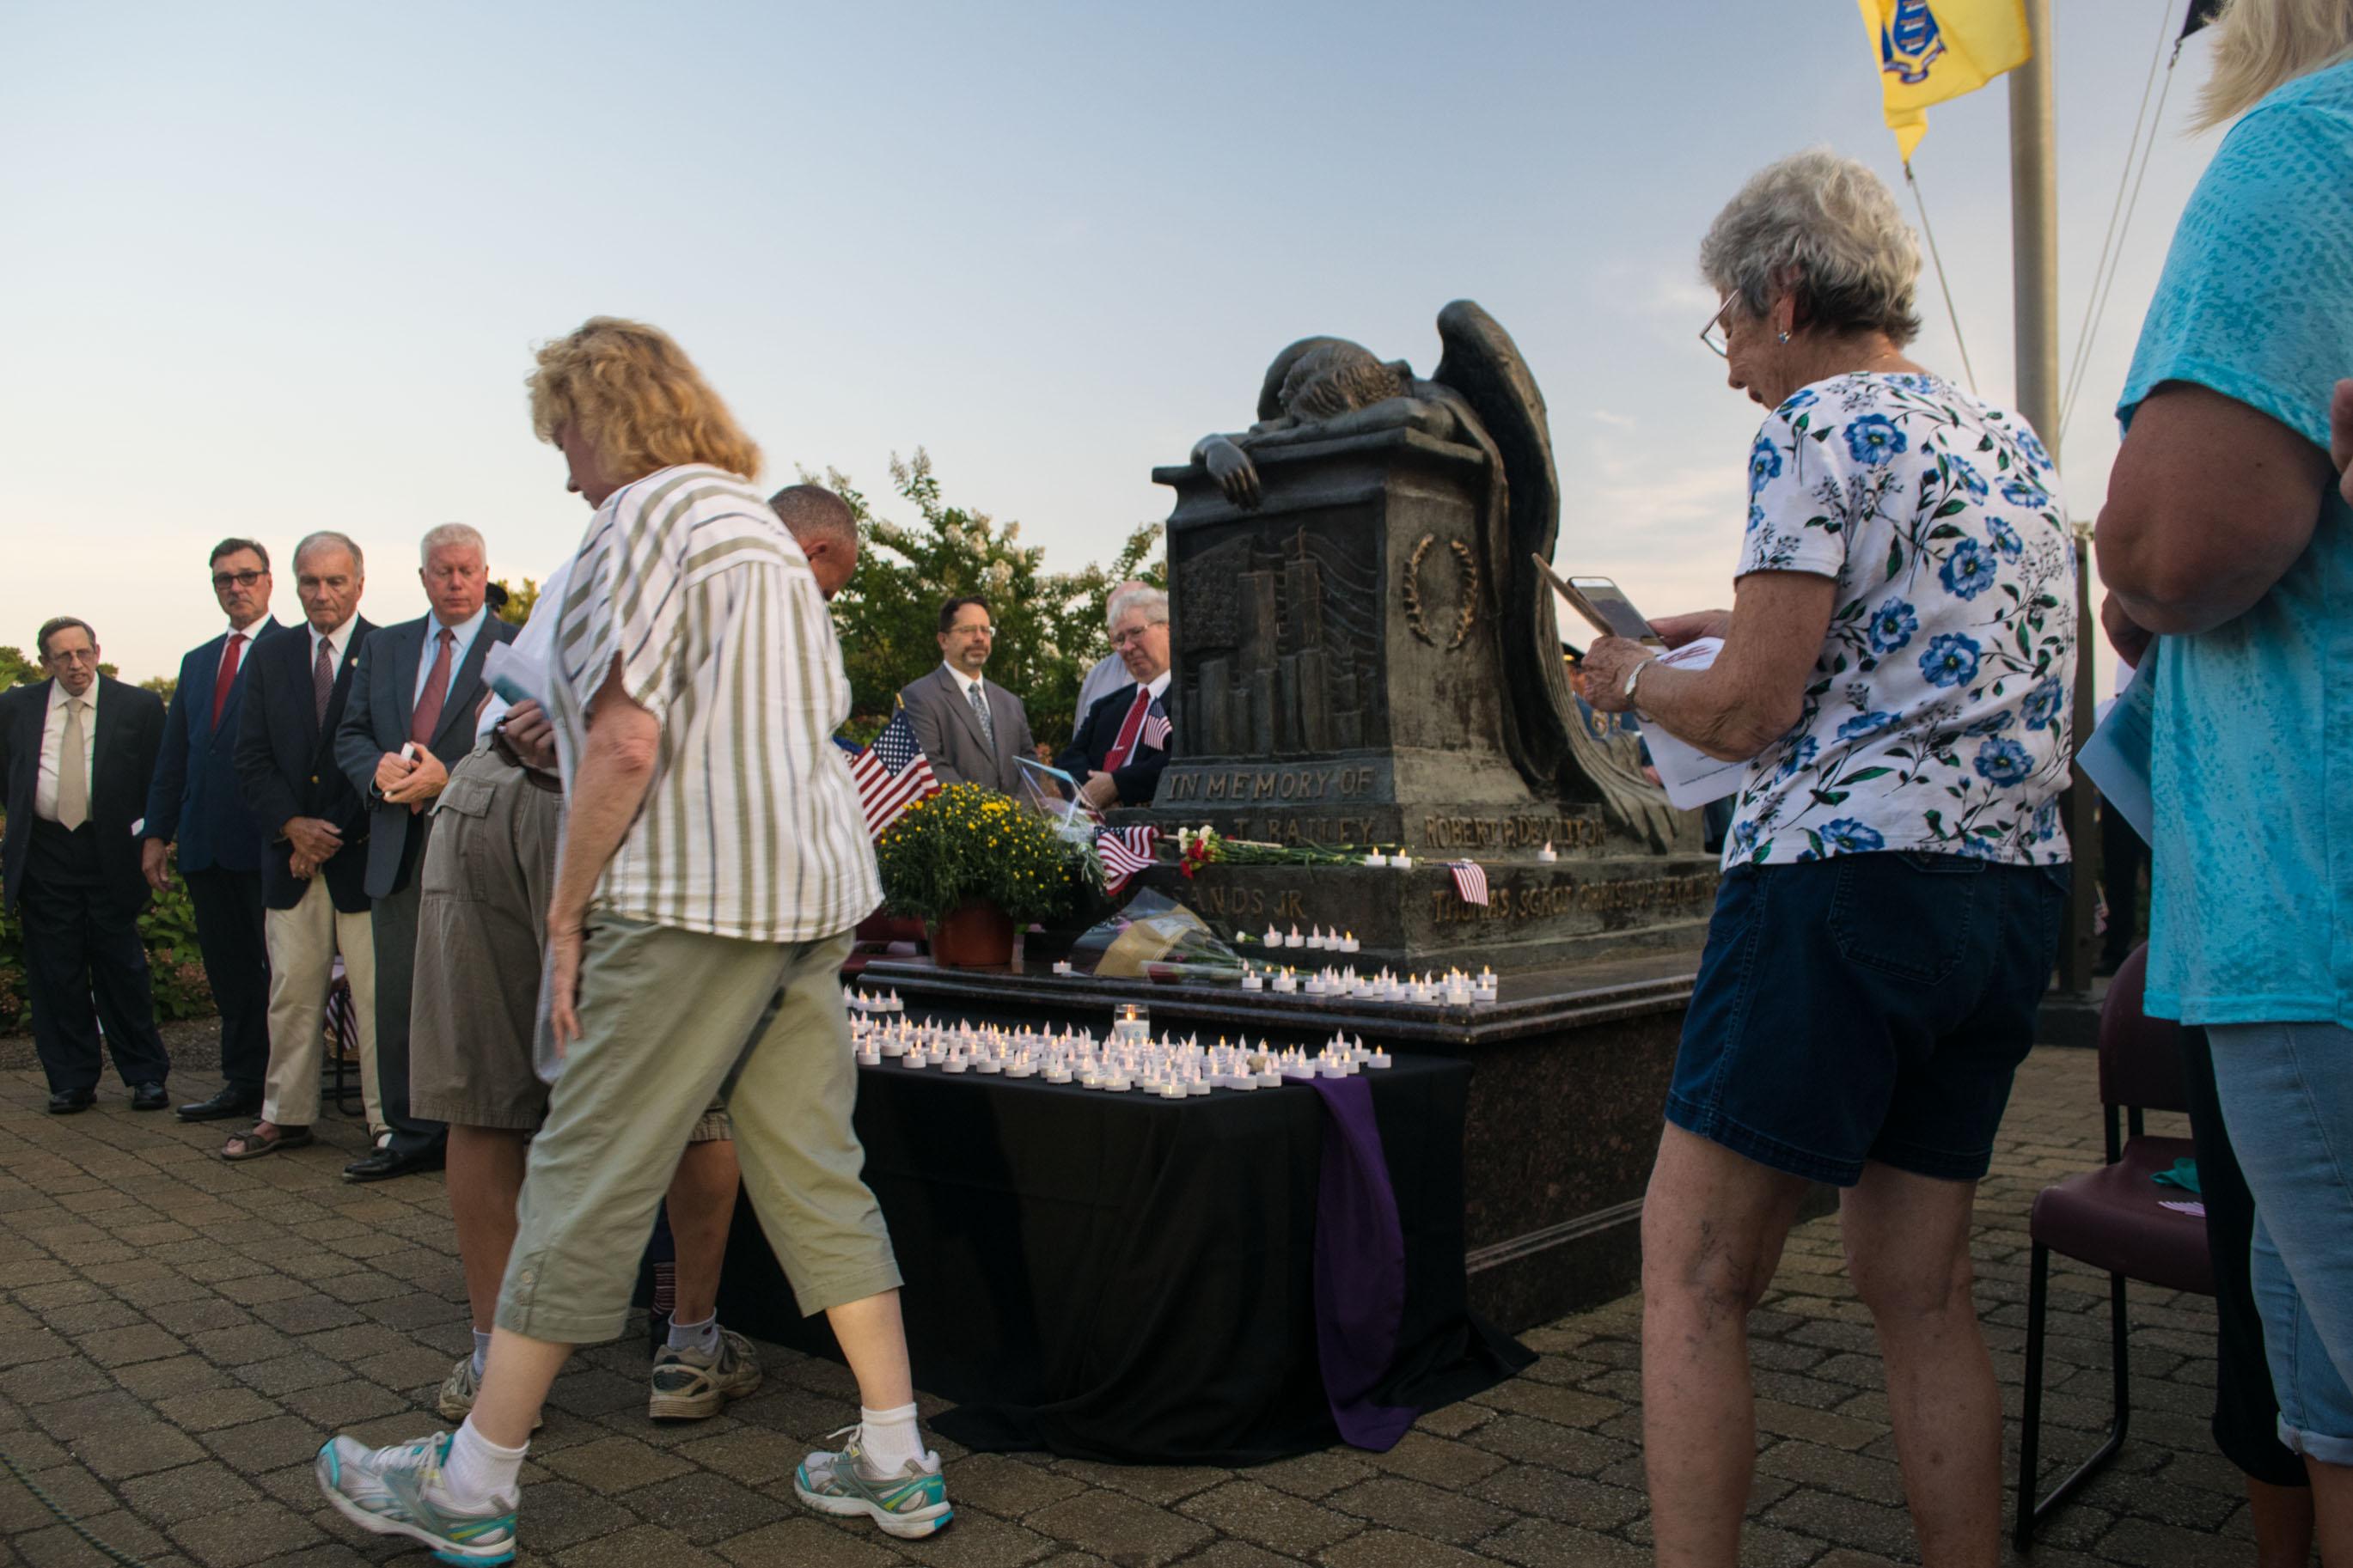 Brick Township's 2019 remembrance ceremony for the 9/11 attacks. (Photo: Daniel Nee)